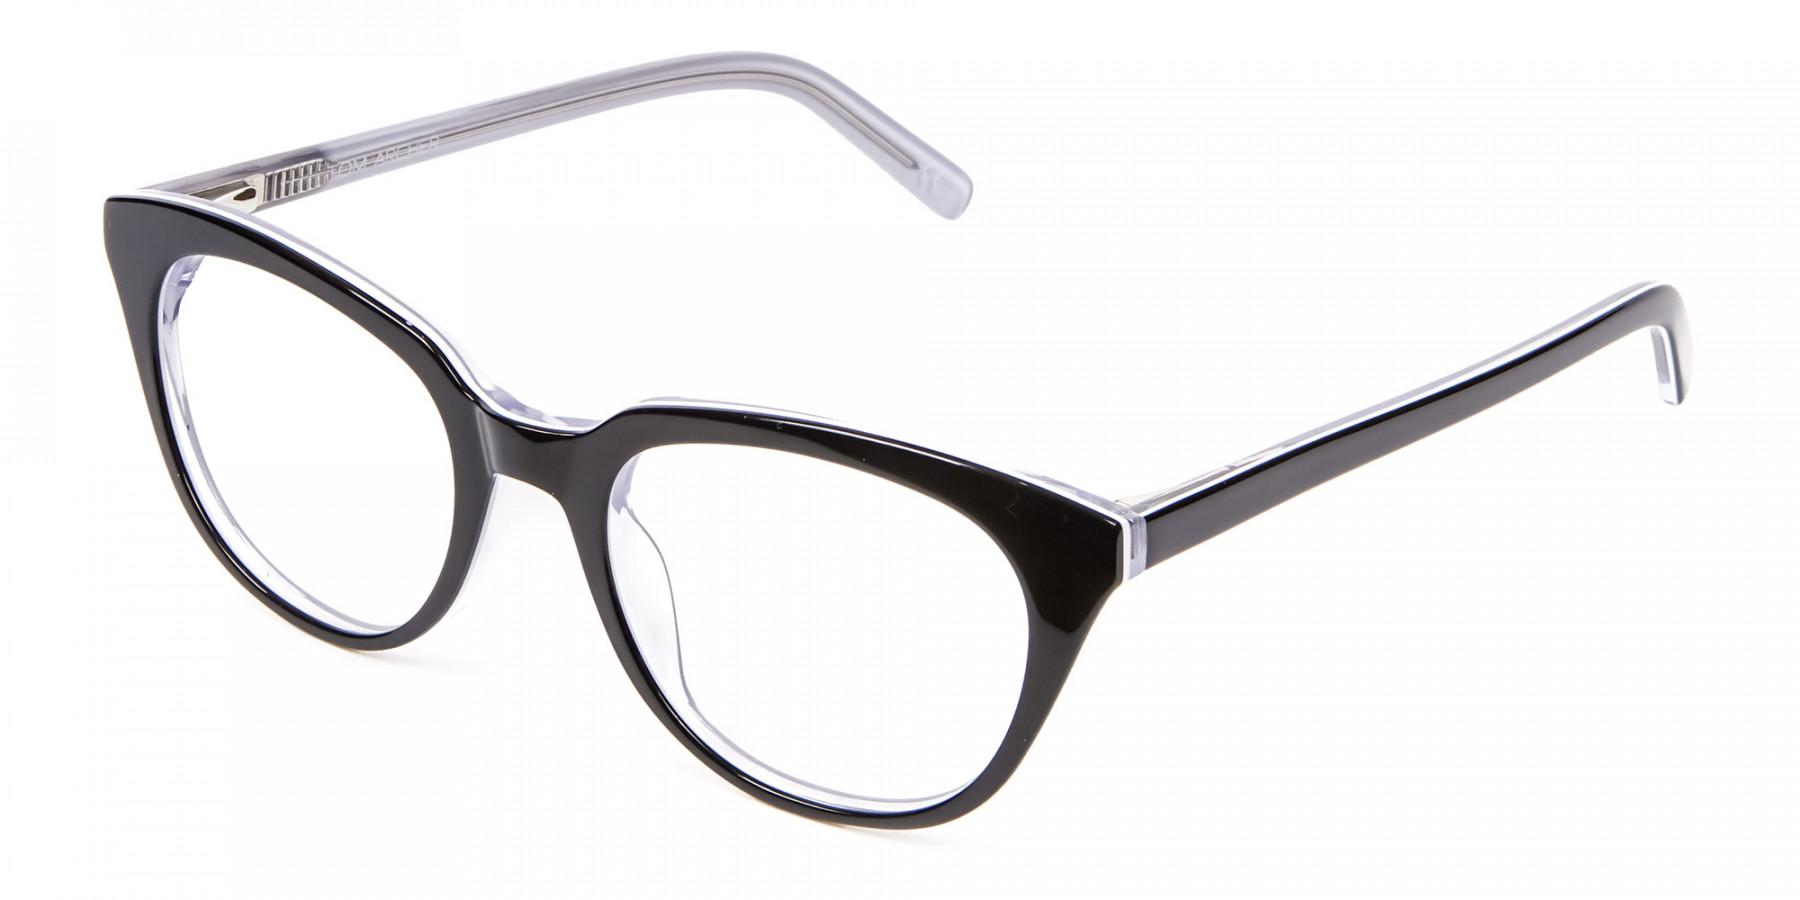 Black and White Combo Super Wild Cat Eye Frame